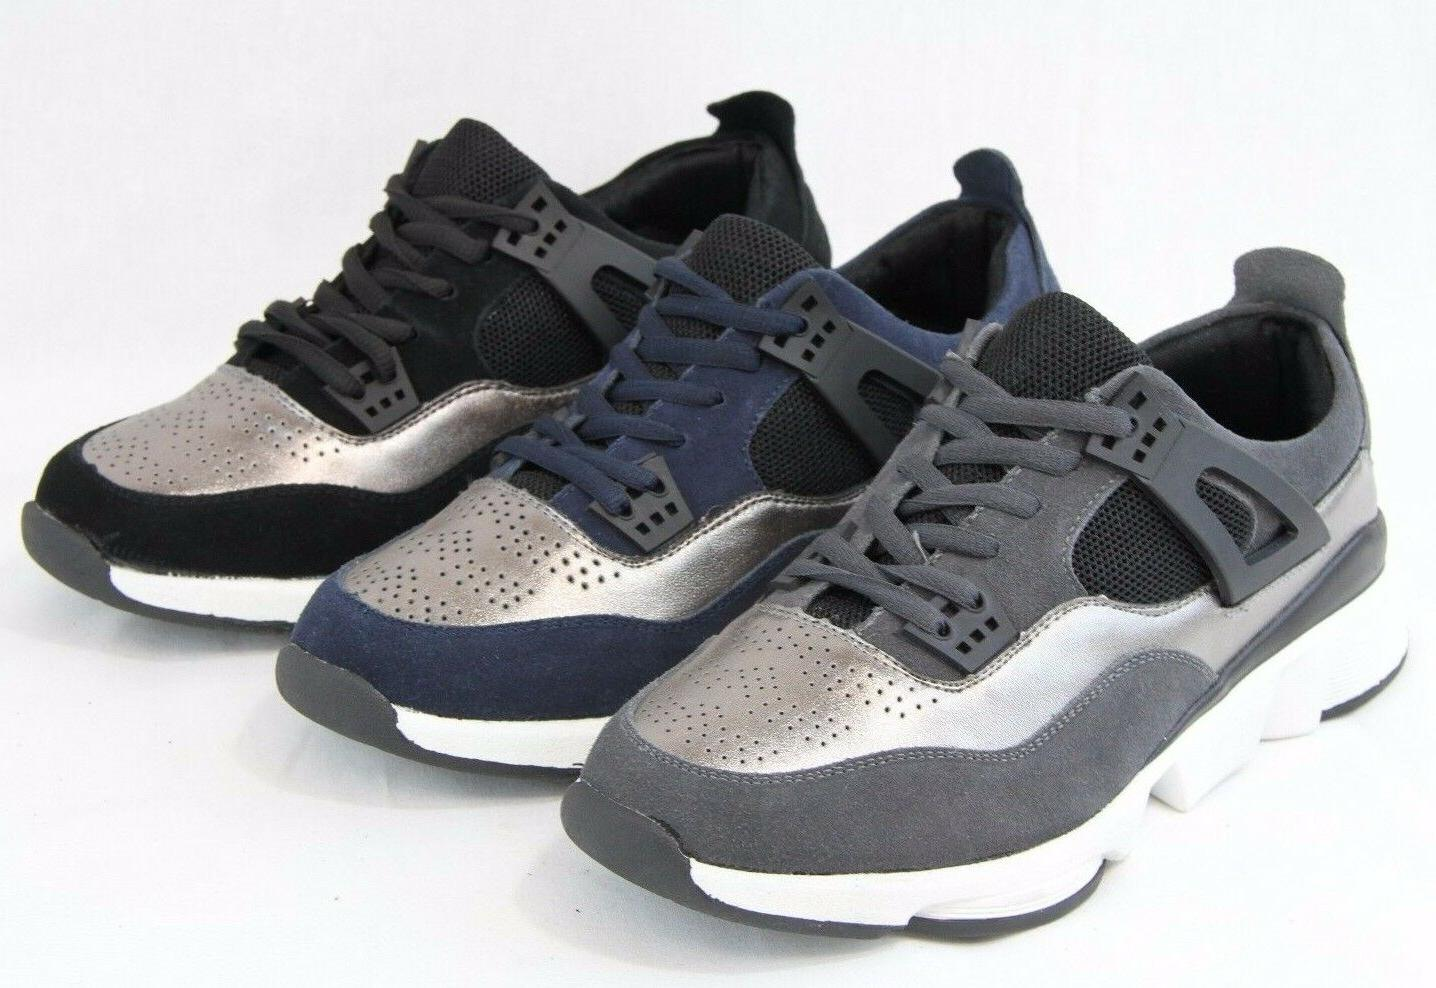 Men Suede Leather Retro Tennis Sneakers Walking Fashion Shoe